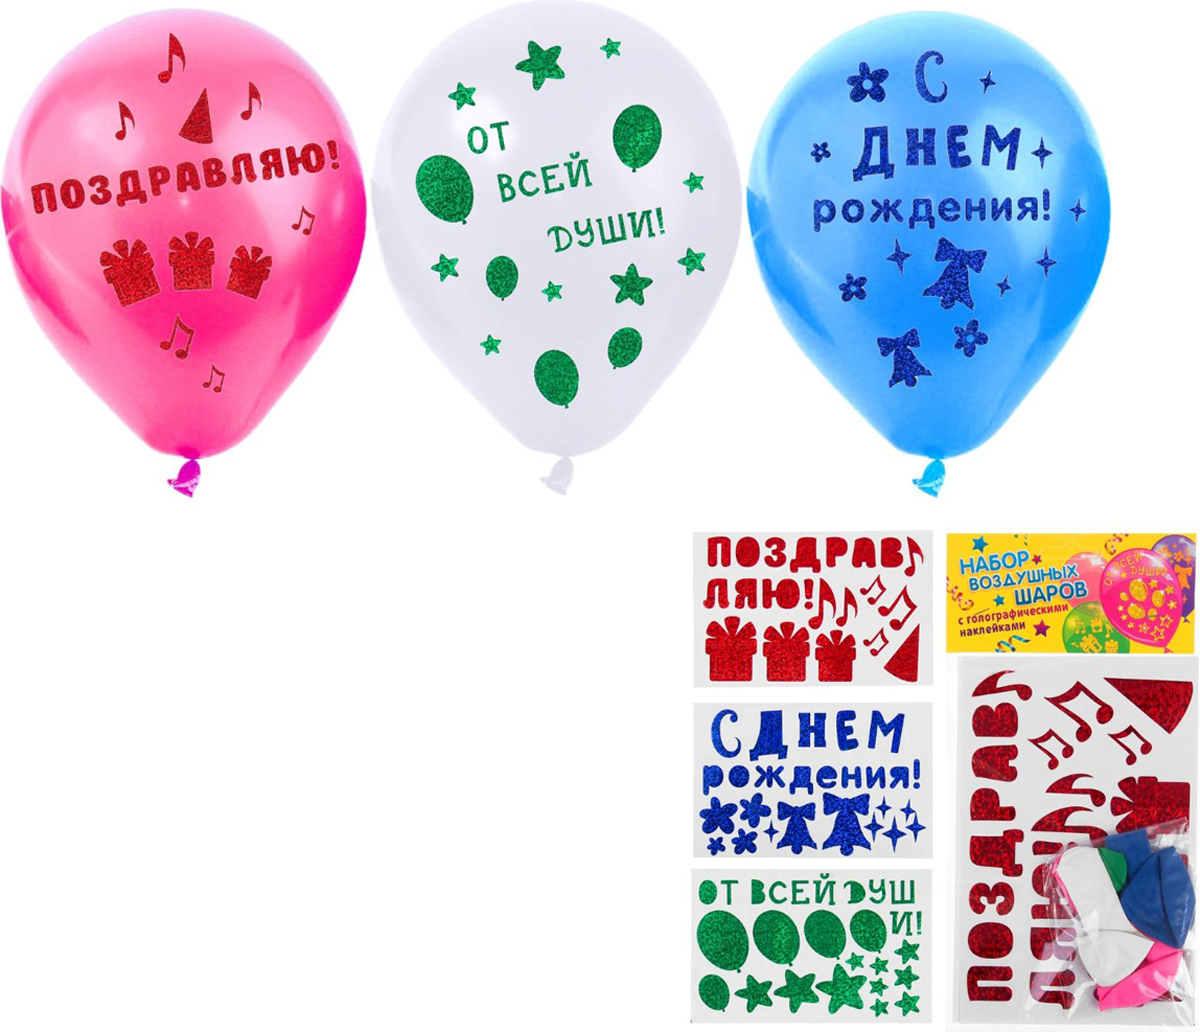 На бумажке в шарики поздравления